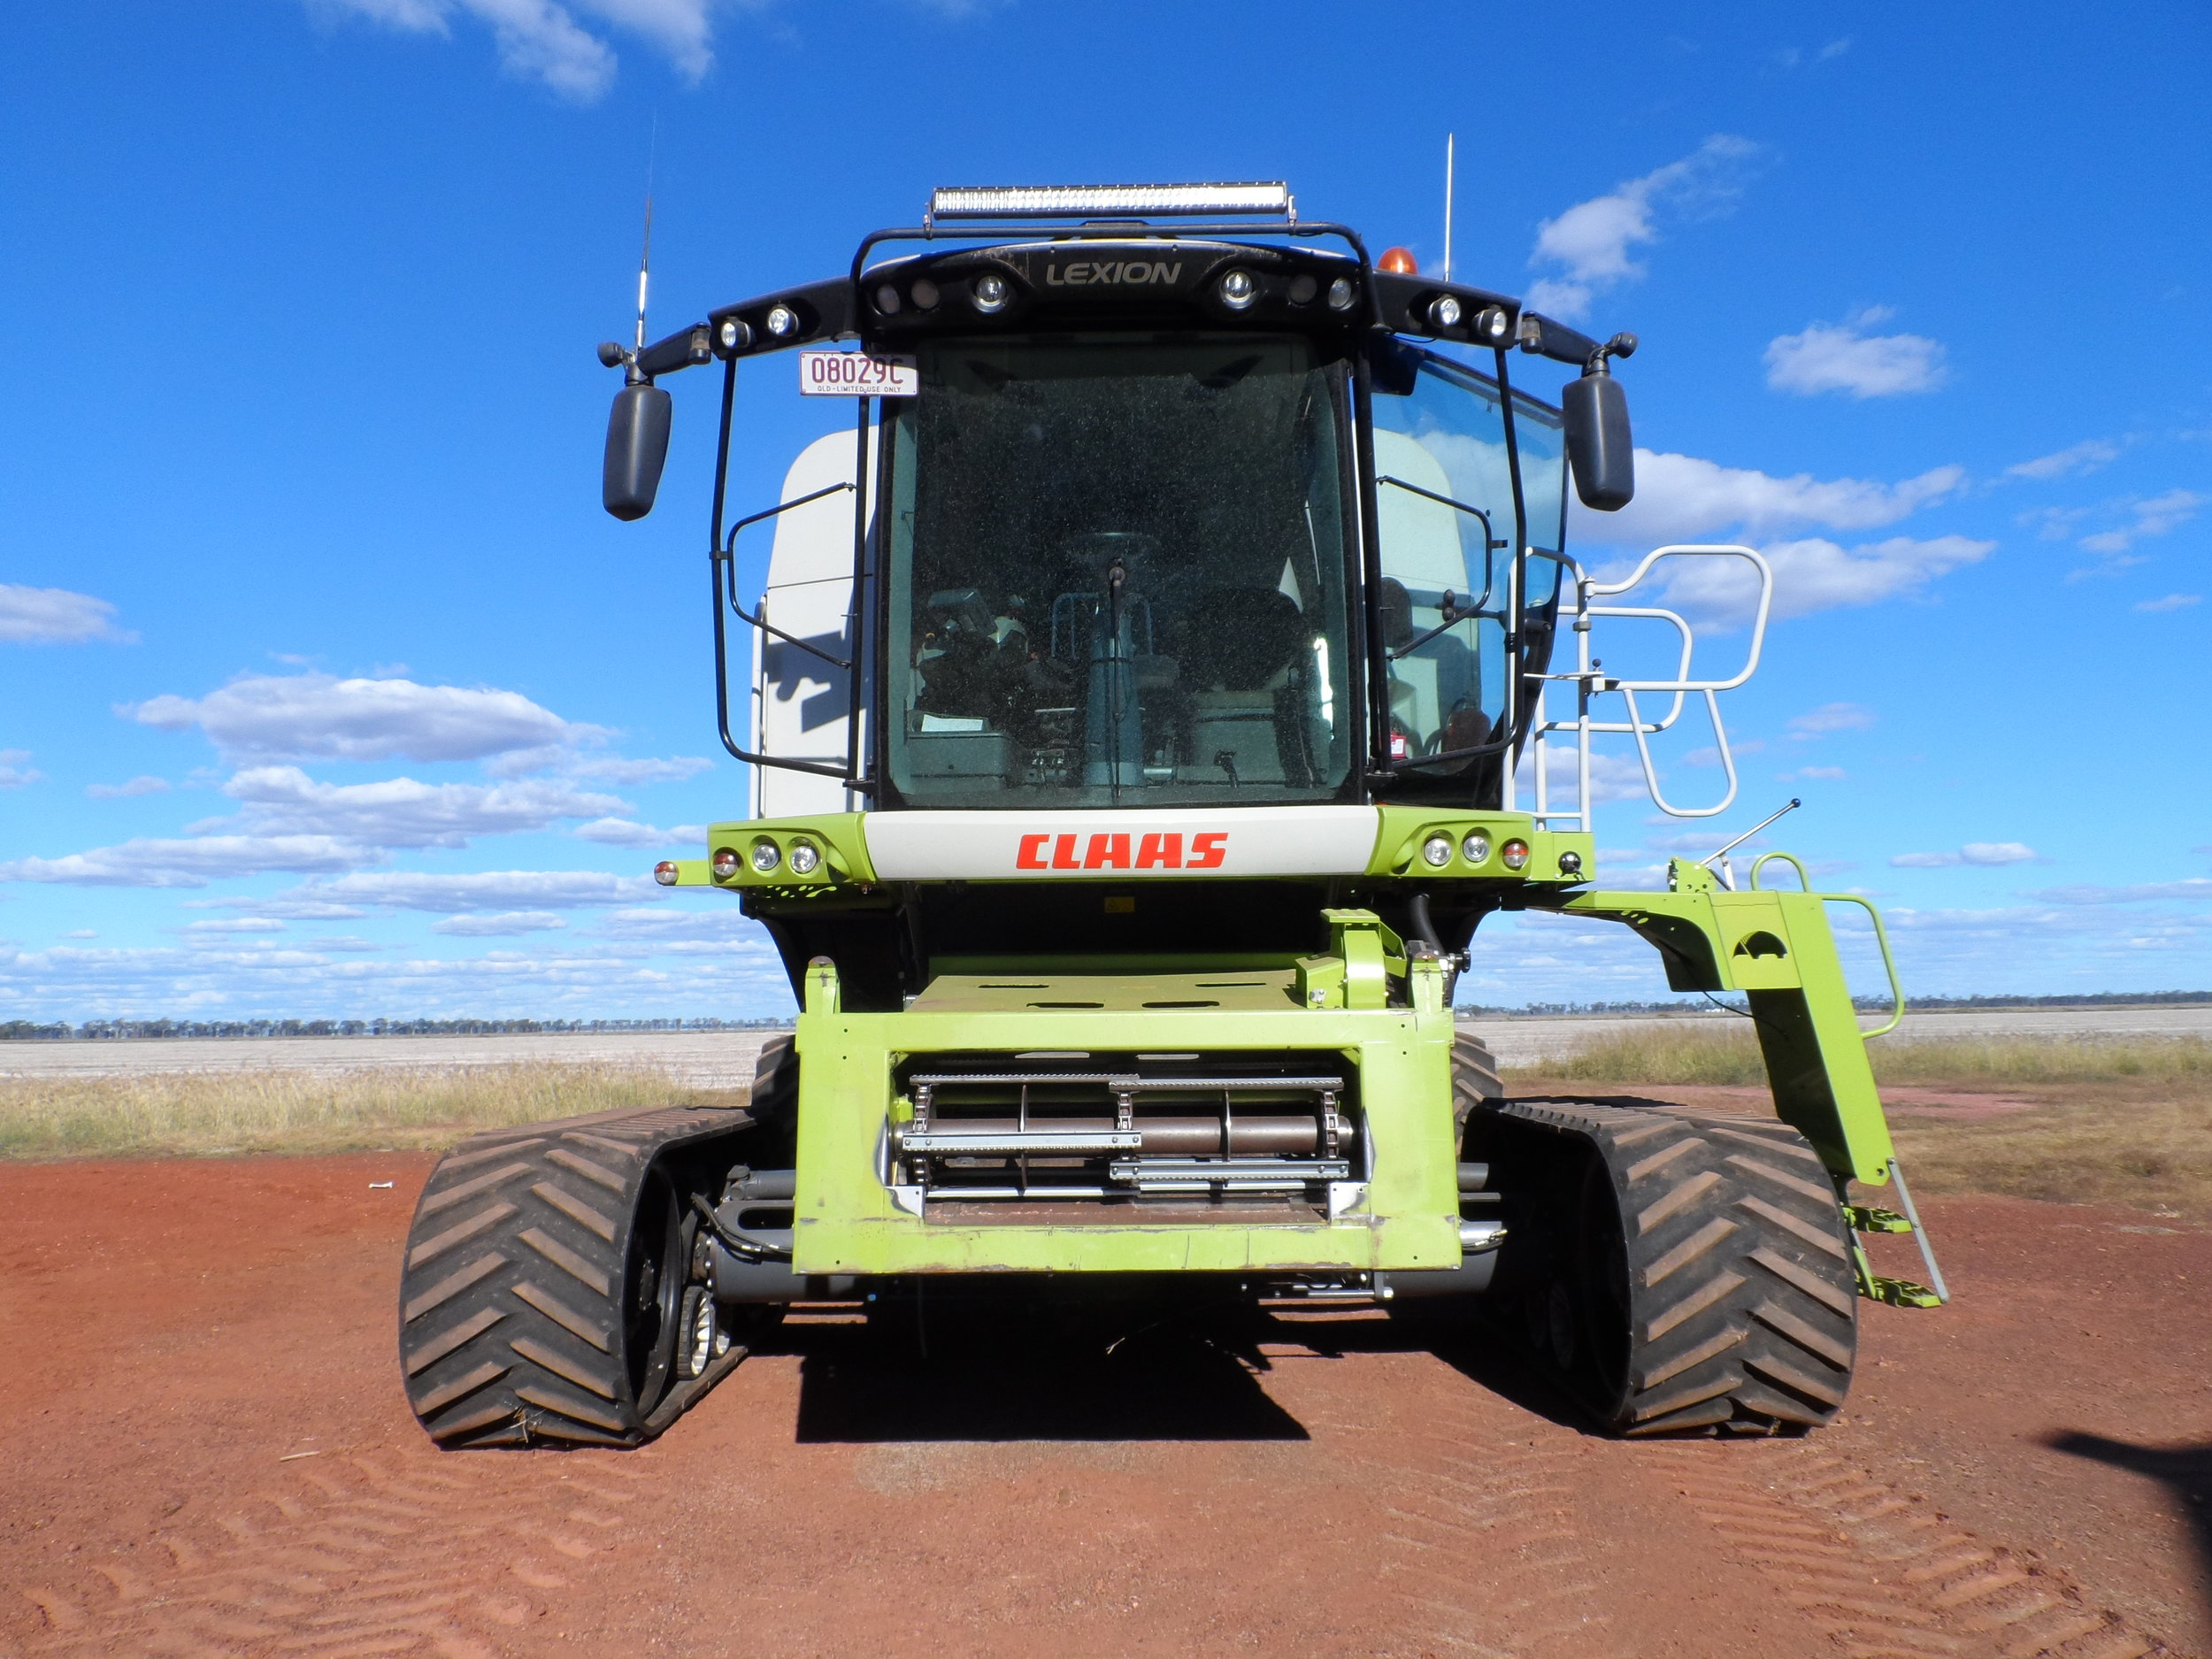 Claas Harvester on 4m track